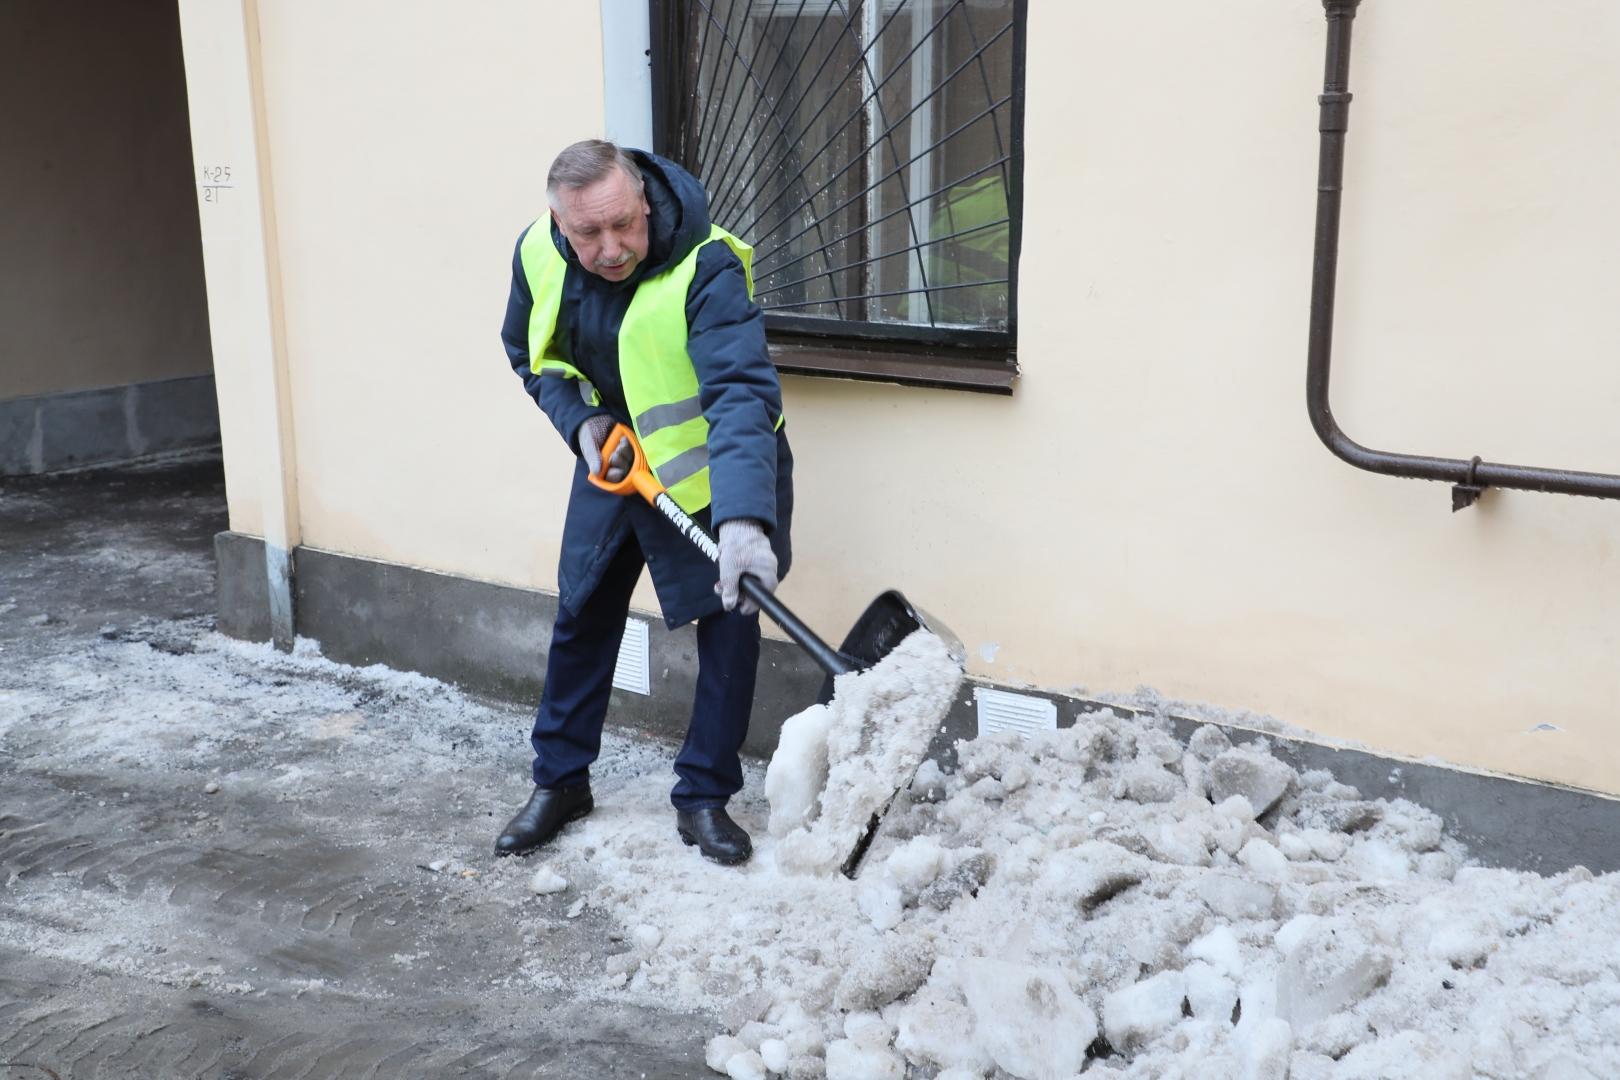 Александр Беглов убирает двор на Петроградской стороне, 09.02.19